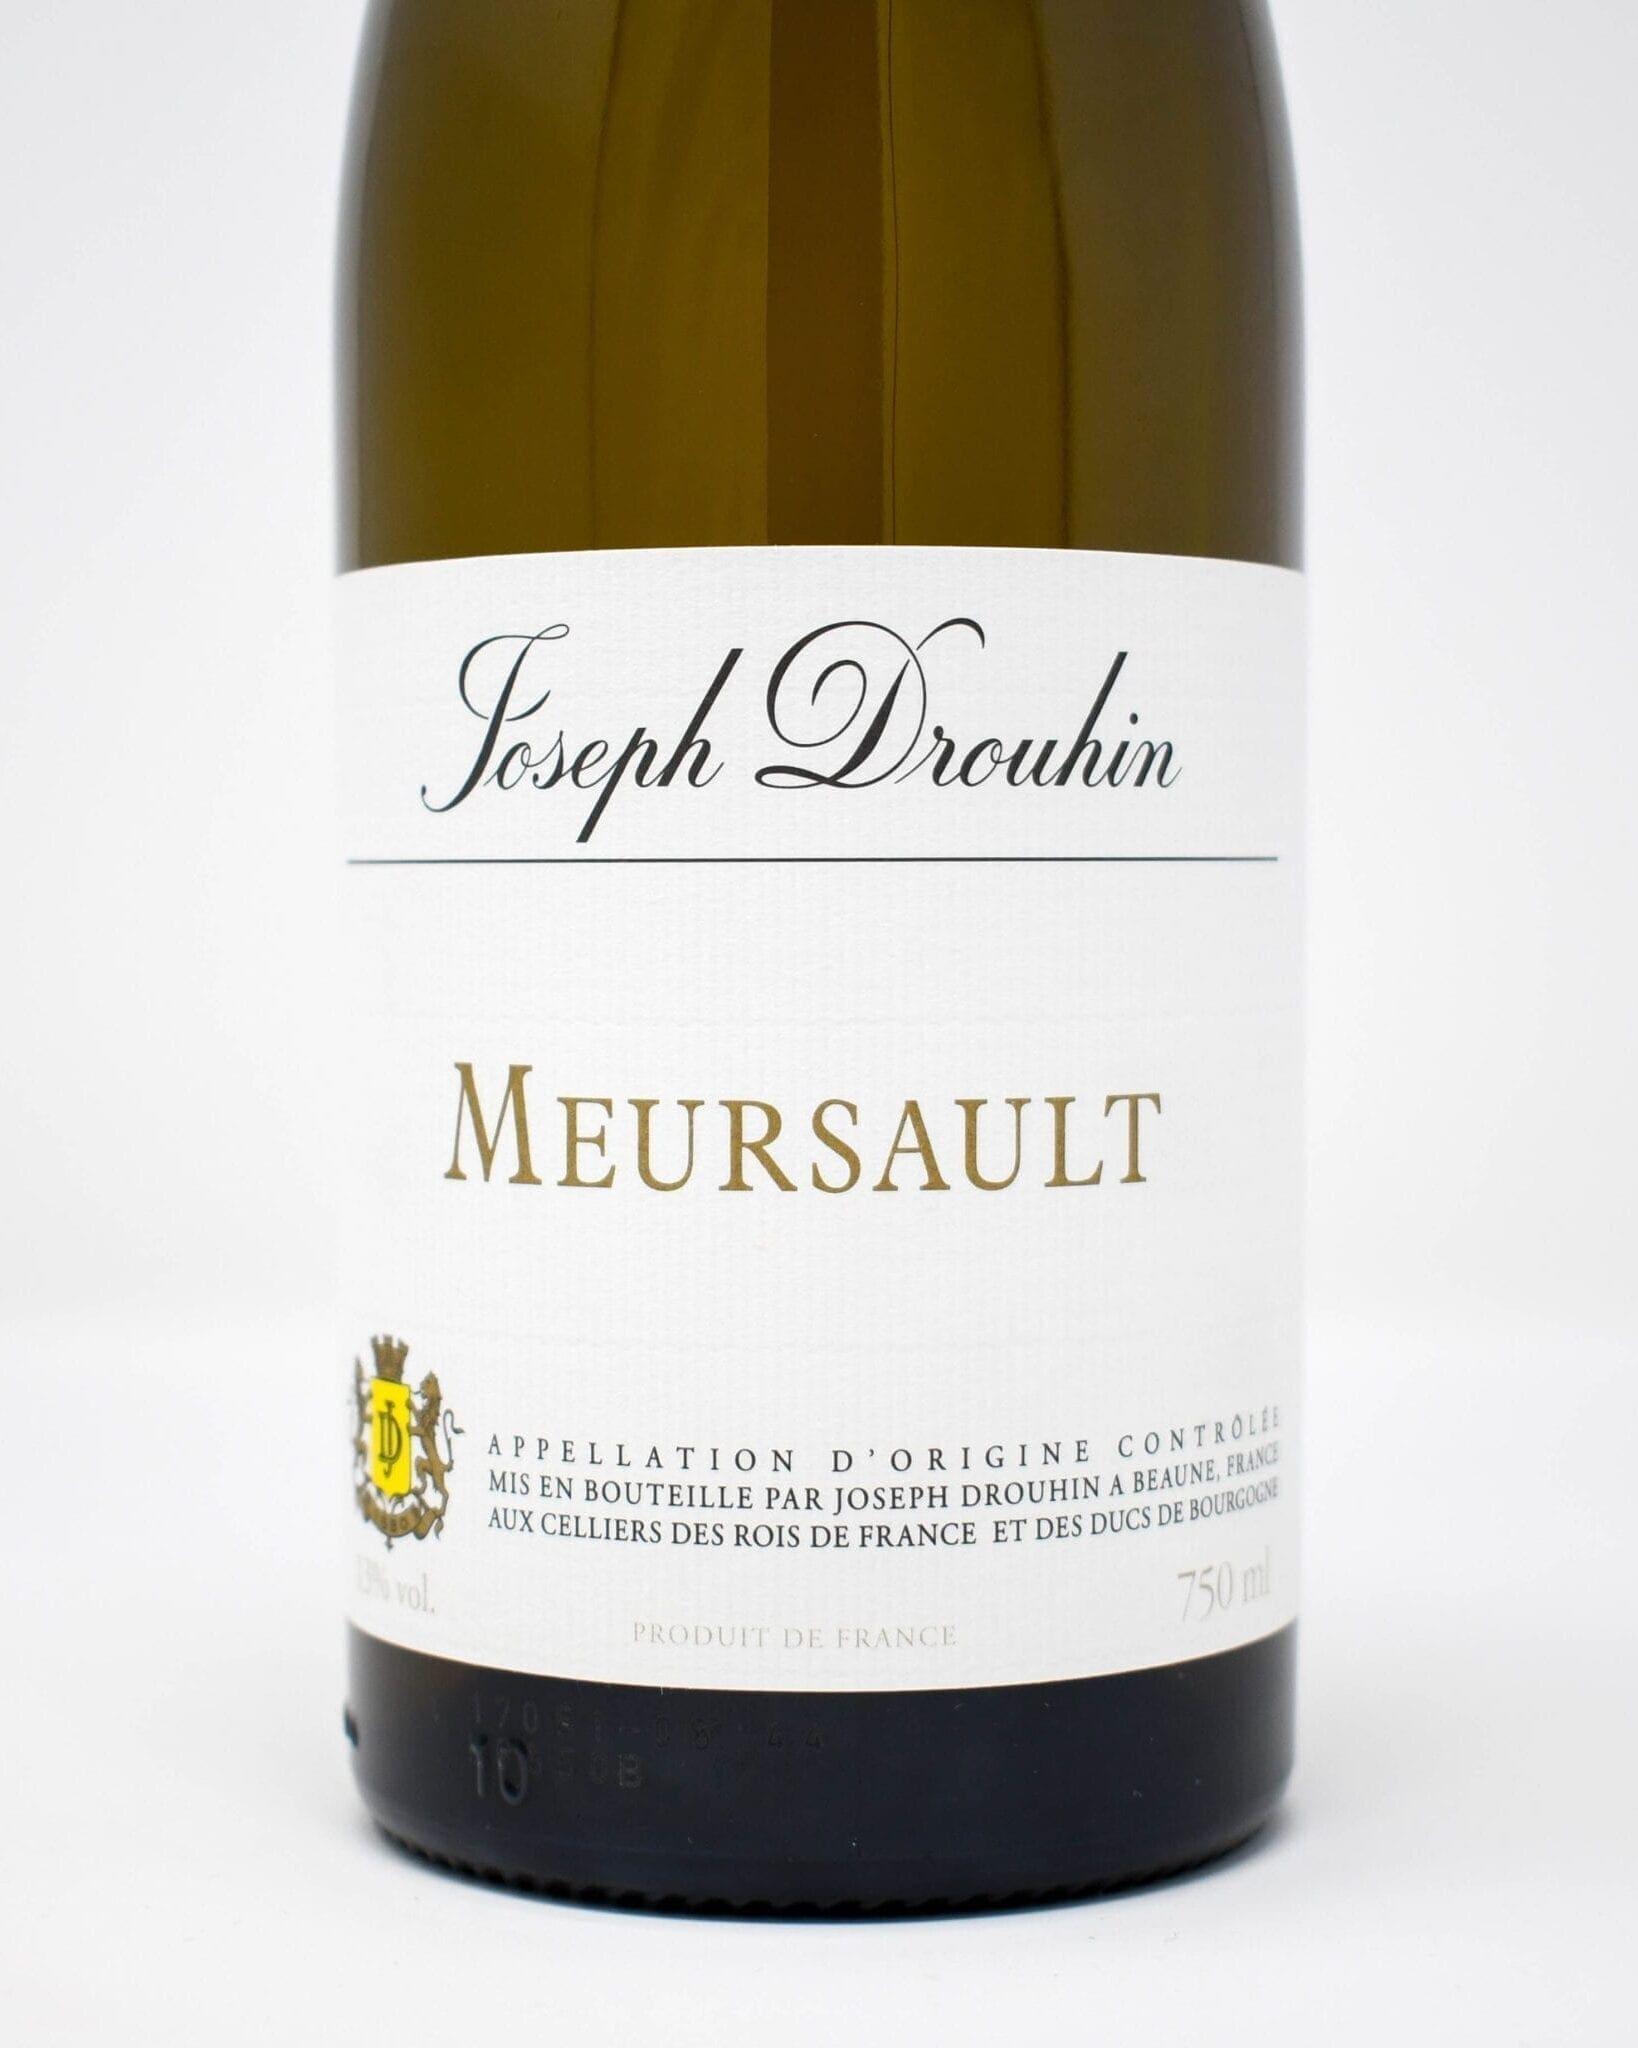 Joseph Drouhin, Meursault